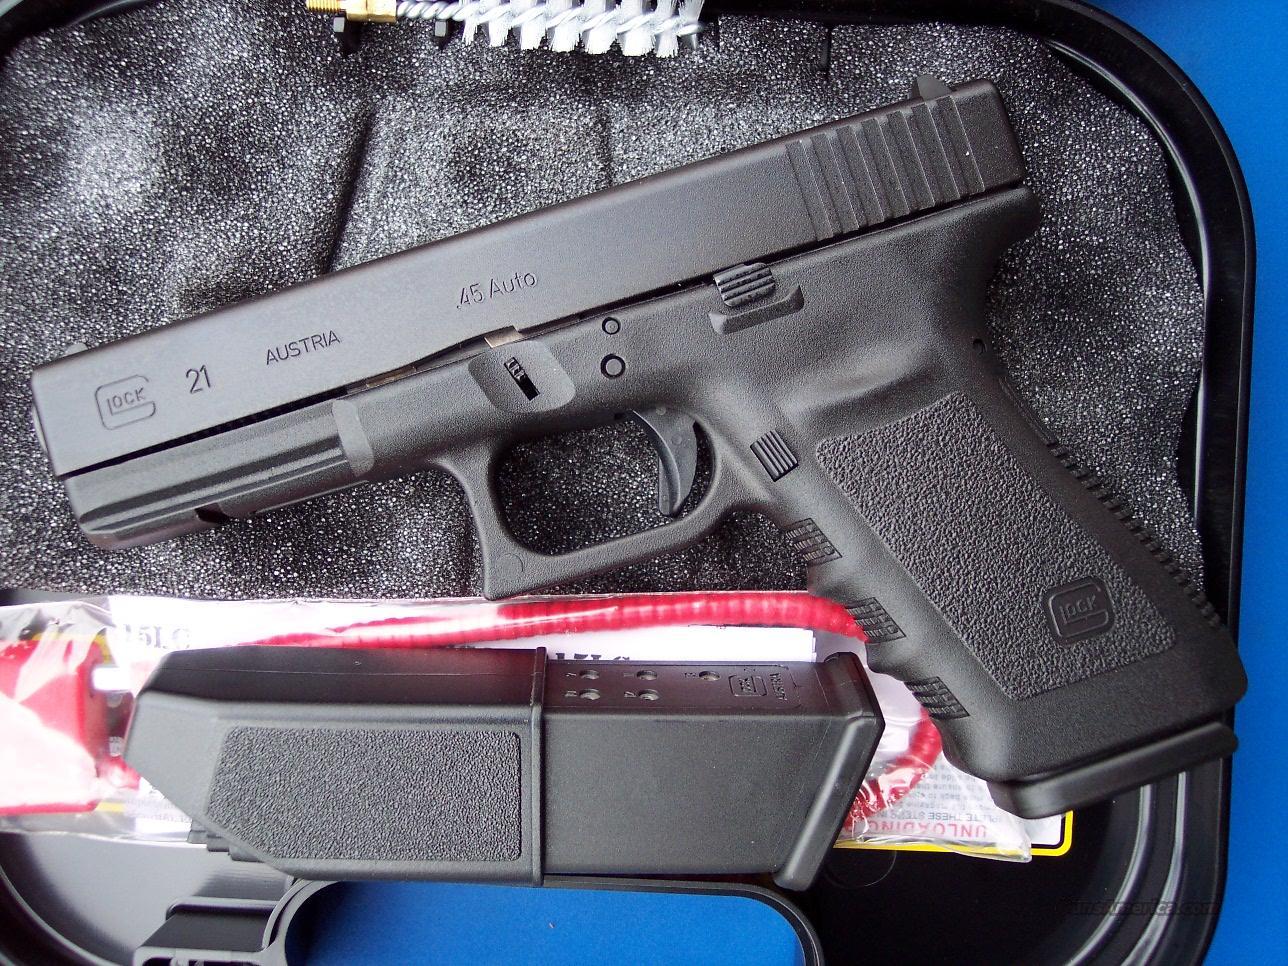 Glock 21 SF 45 acp Short Frame 13 Round Mags 21SF  NIB  Guns > Pistols > Glock Pistols > 20/21